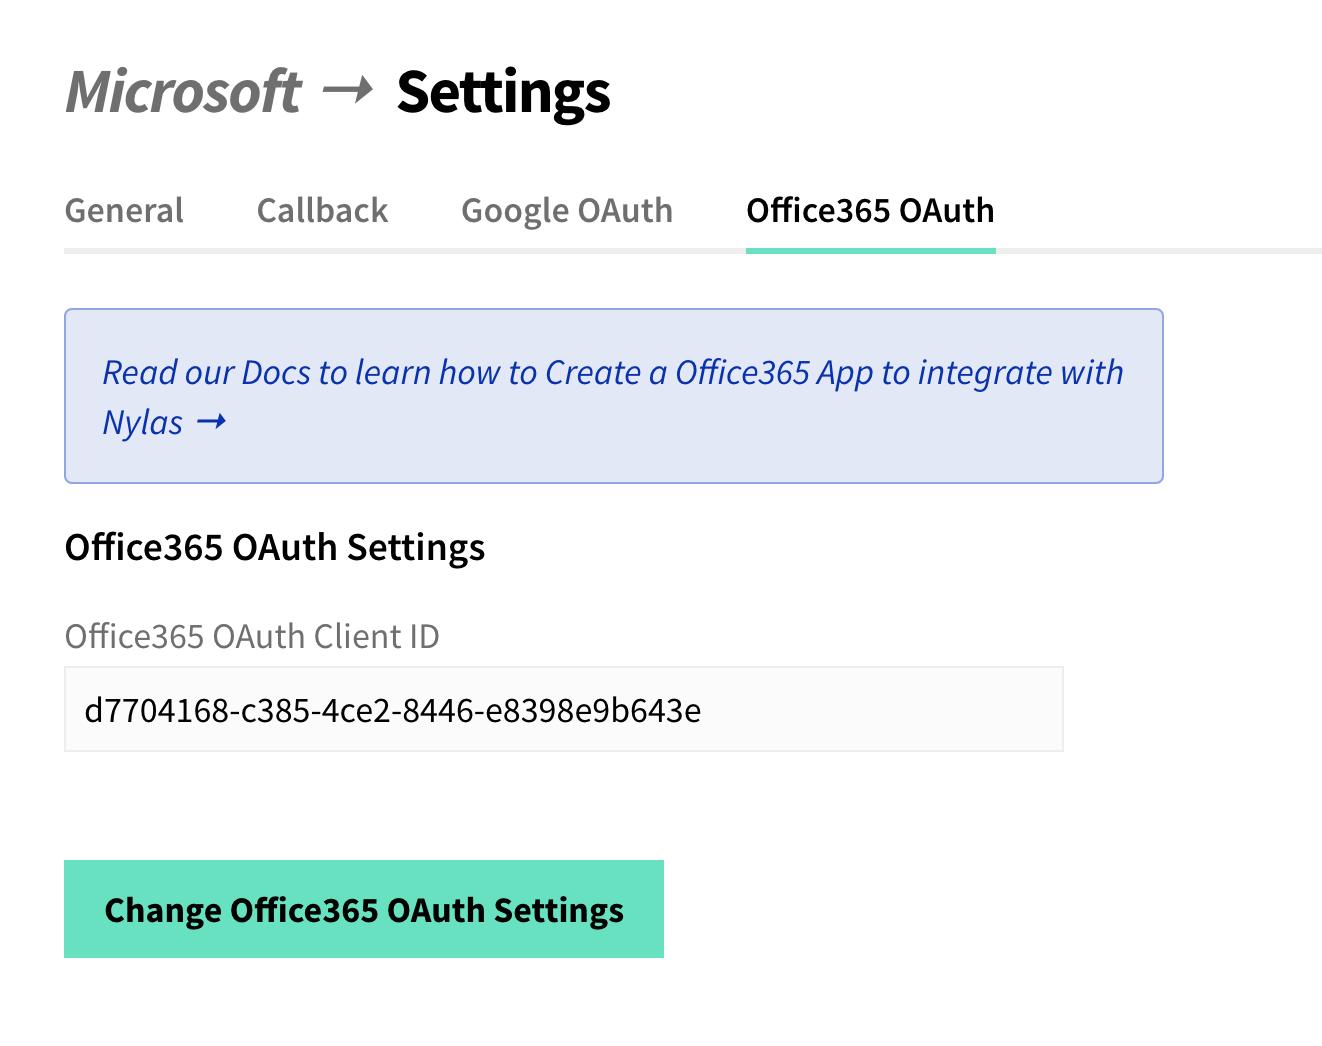 Nylas Dashboard, Microsoft App Settings